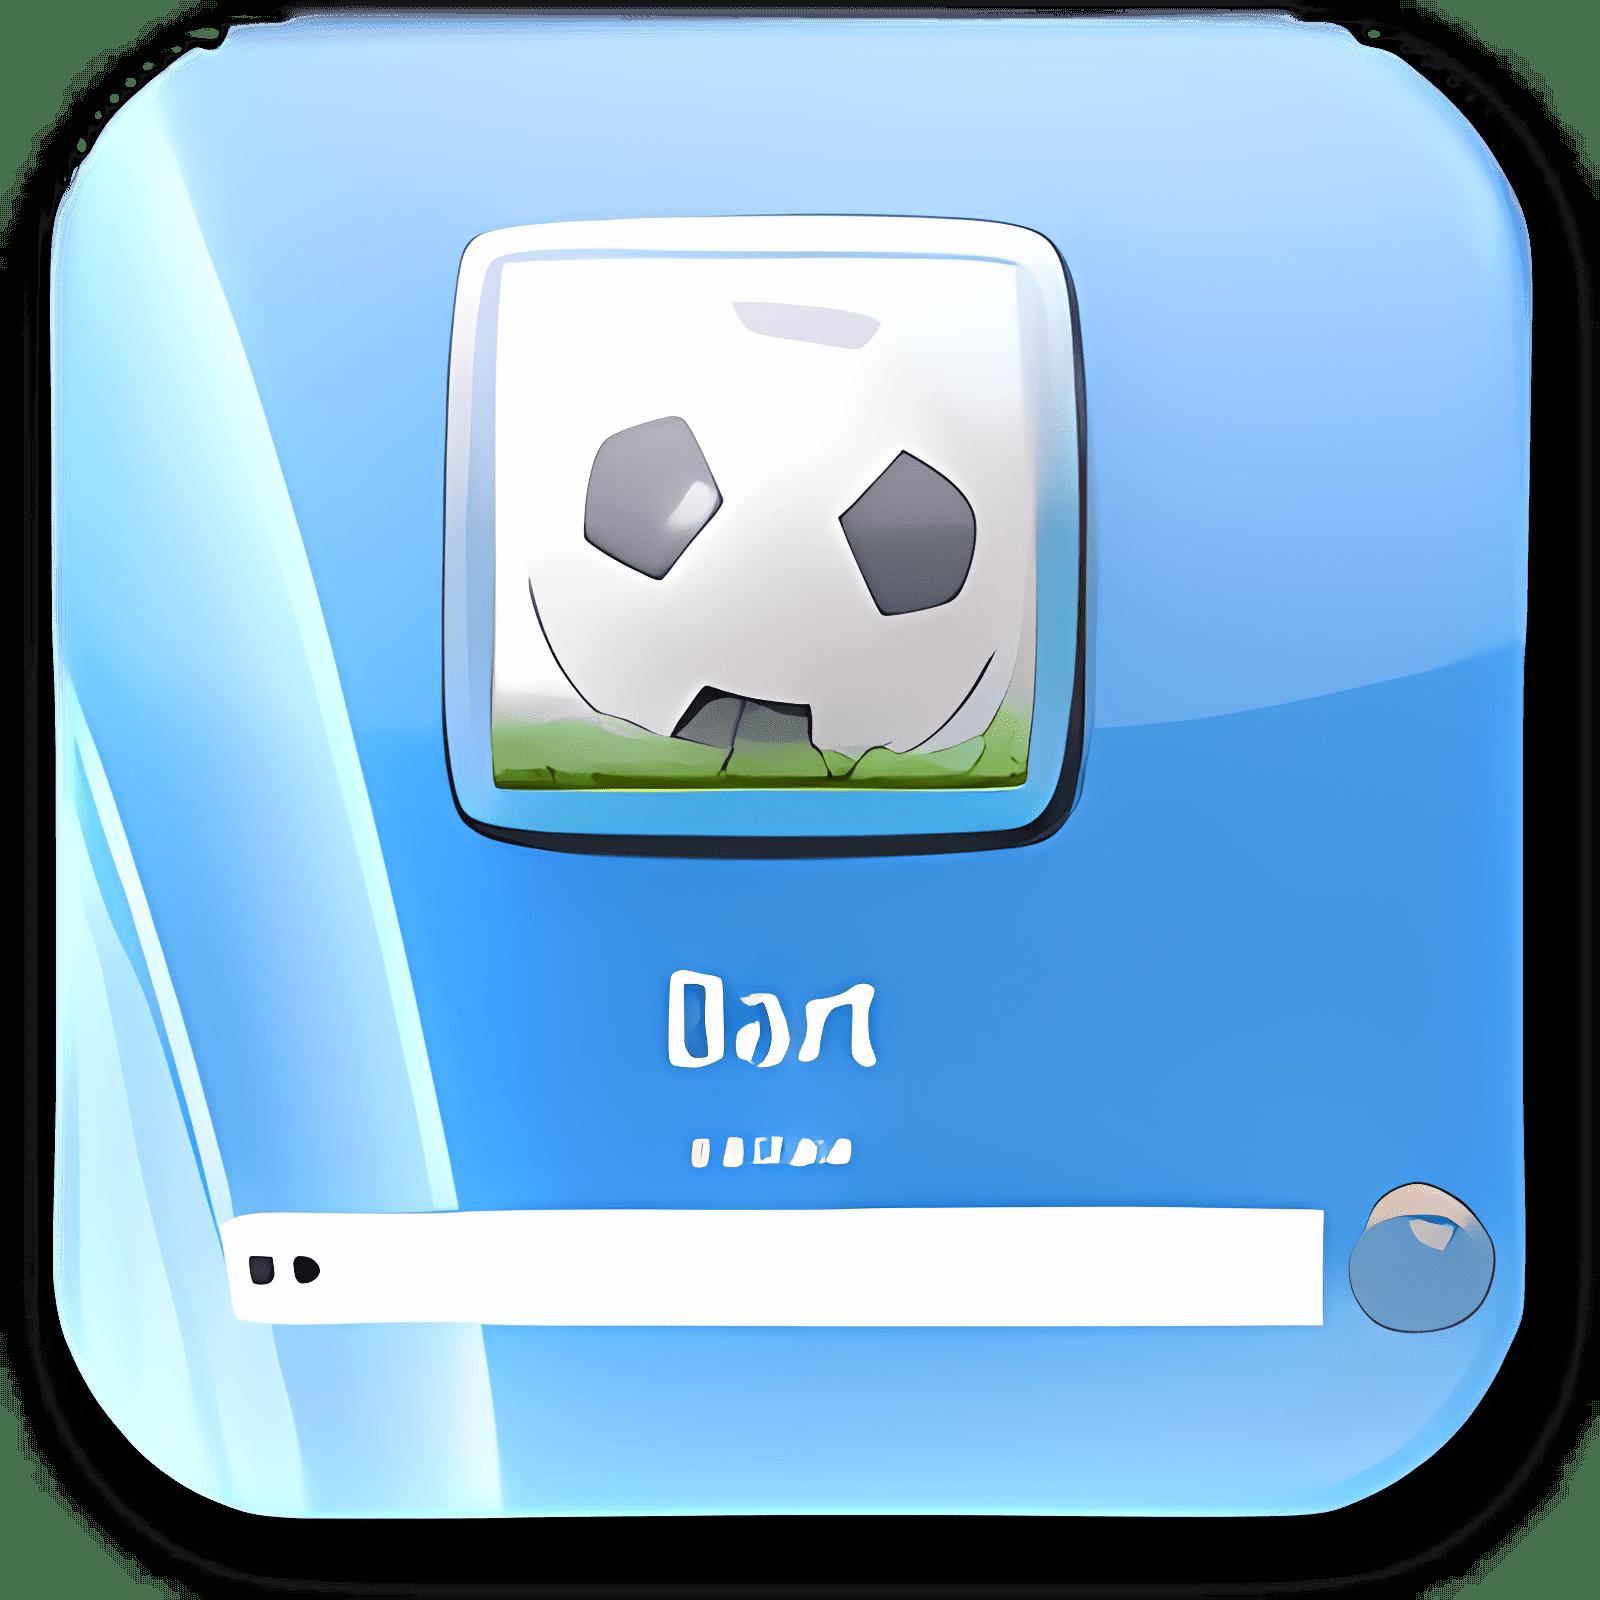 Windows 7 Account Screen Edition